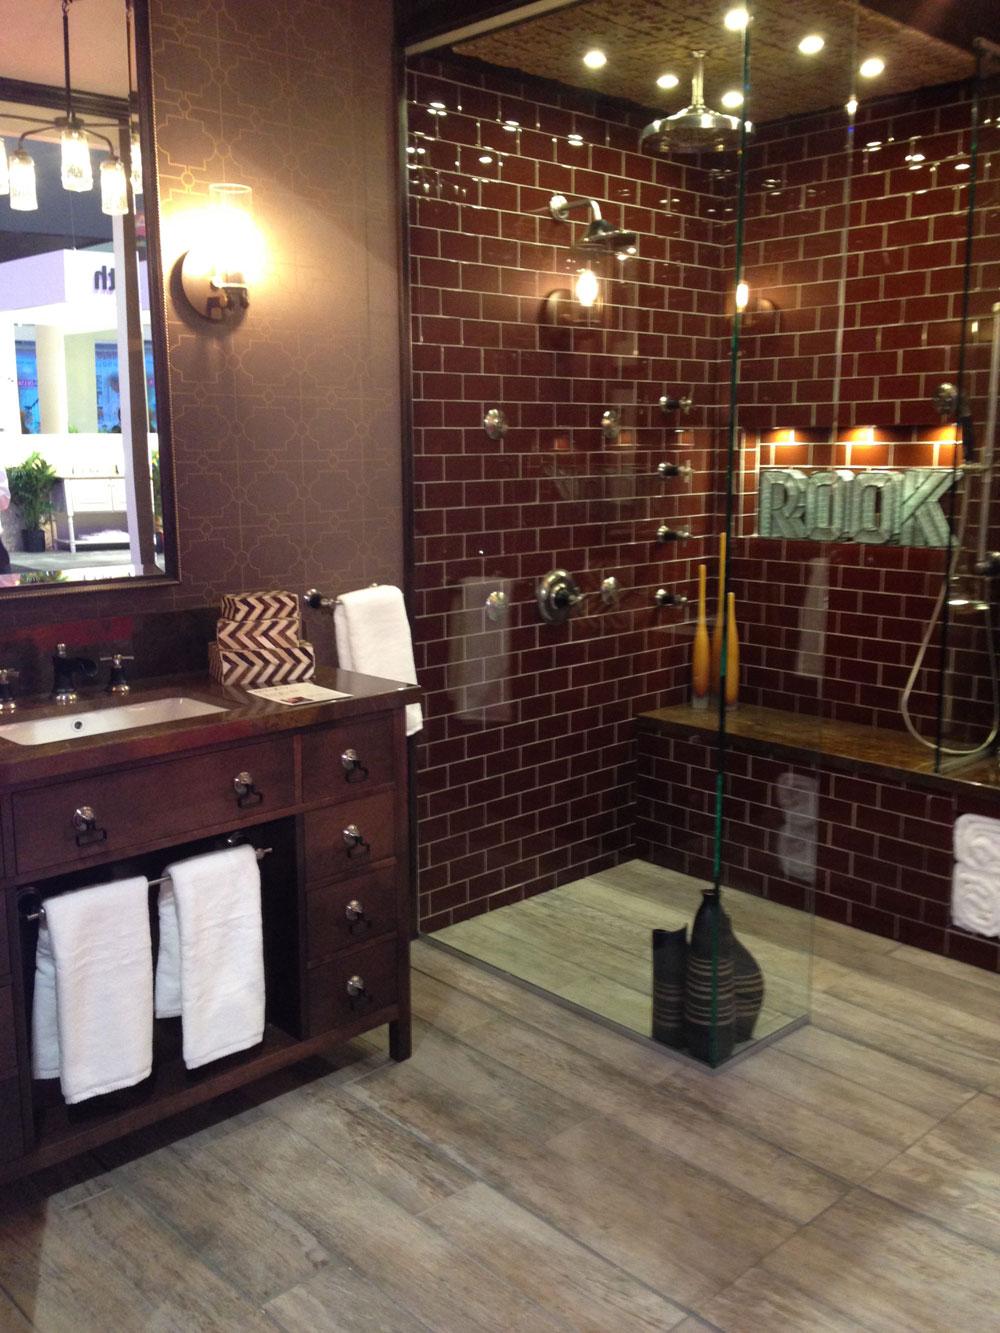 New-Bathroom-Decorating-Ideas-10 New Bathroom-Decorating-Ideas